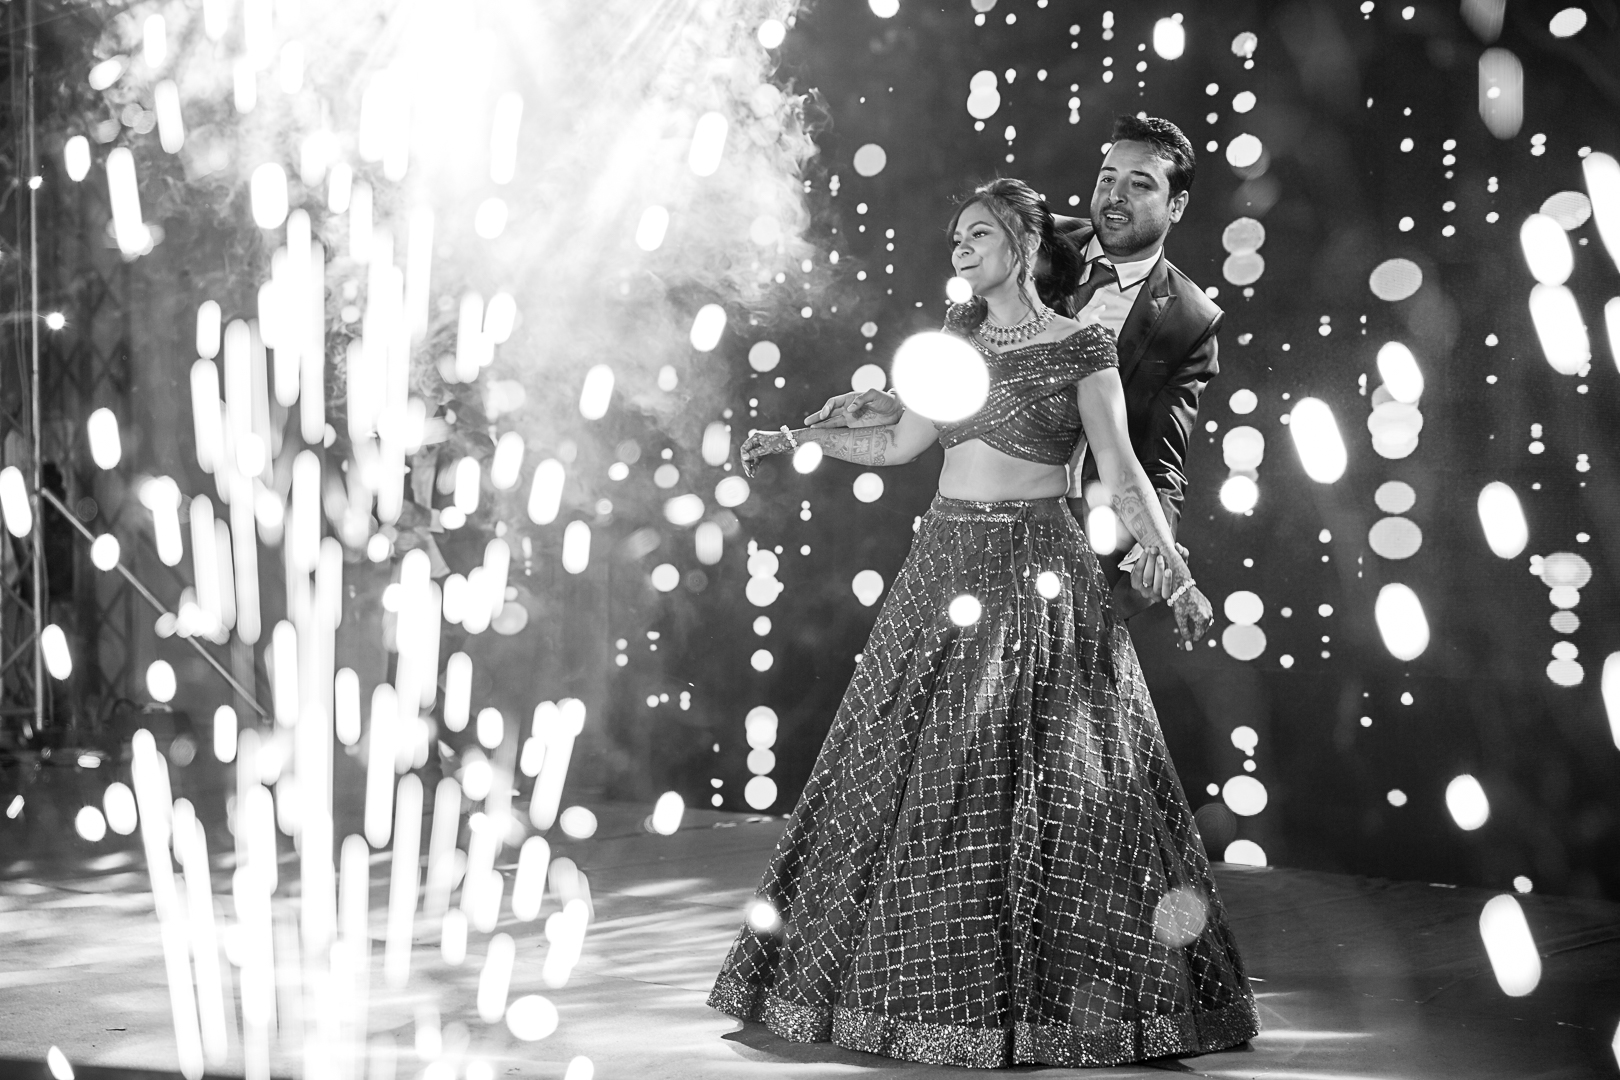 bnw shot of the couple dancing